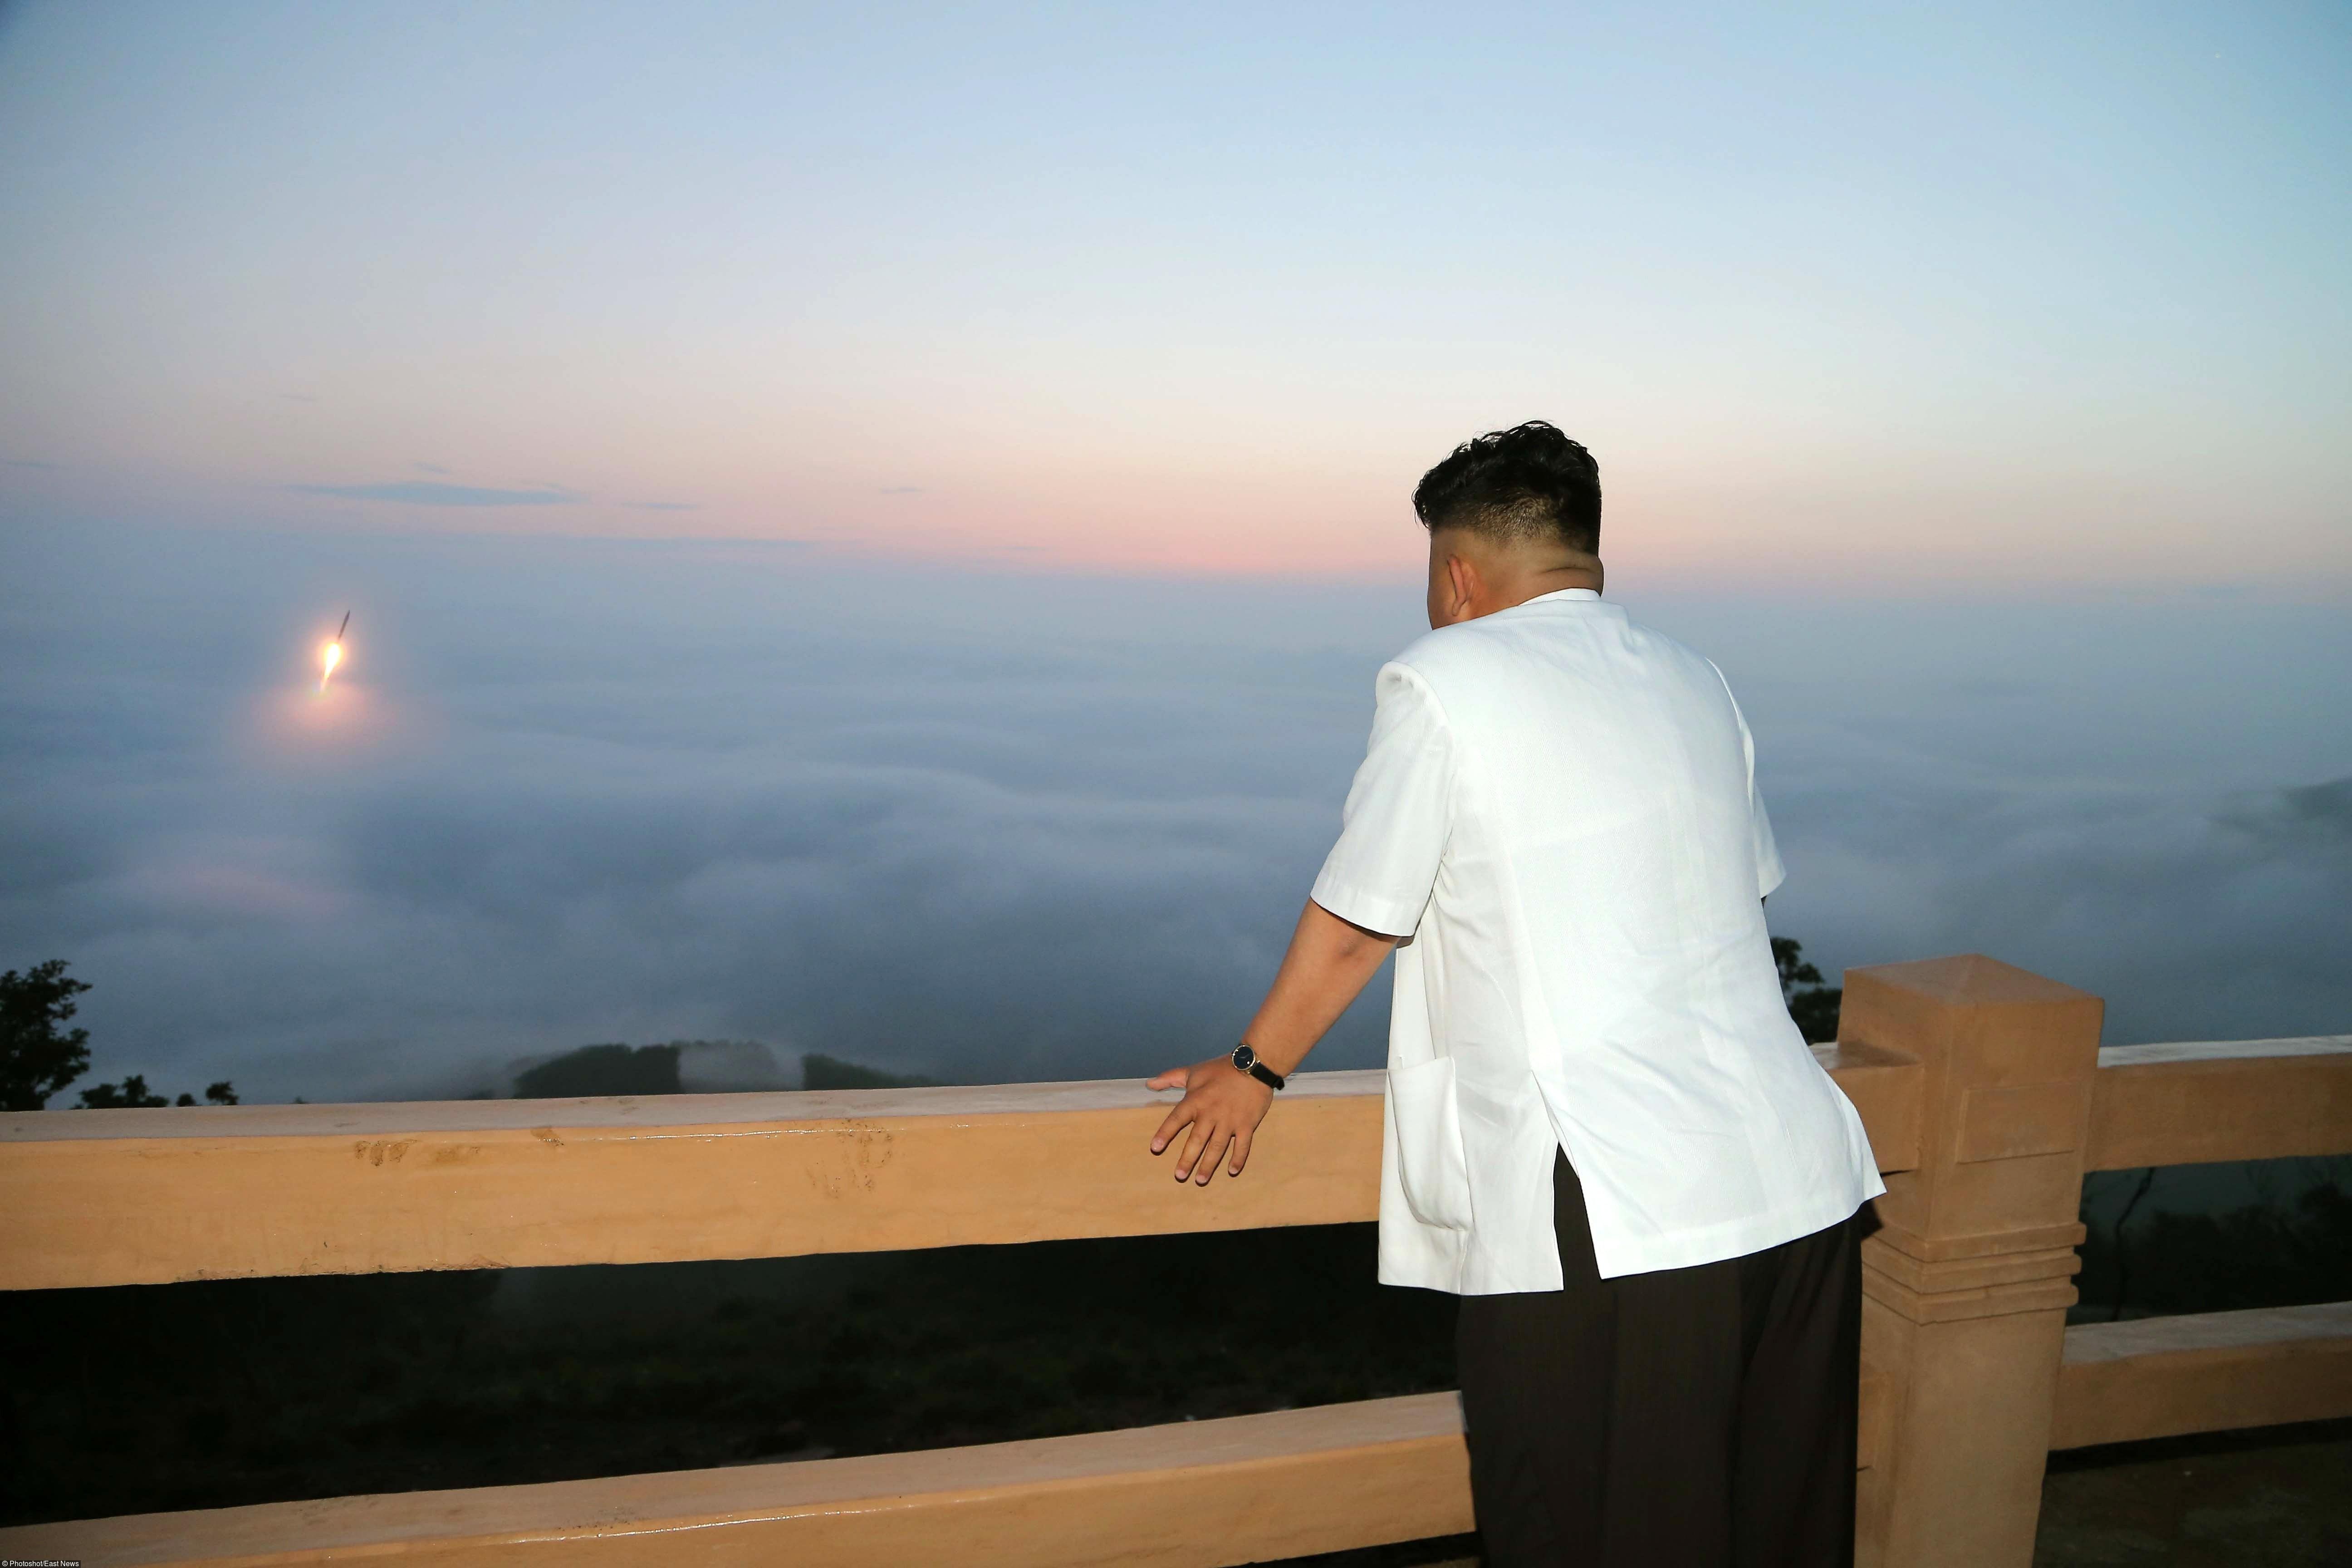 <p><span>Фото &copy; Xinhua/Photoshot/REPORTER</span></p>